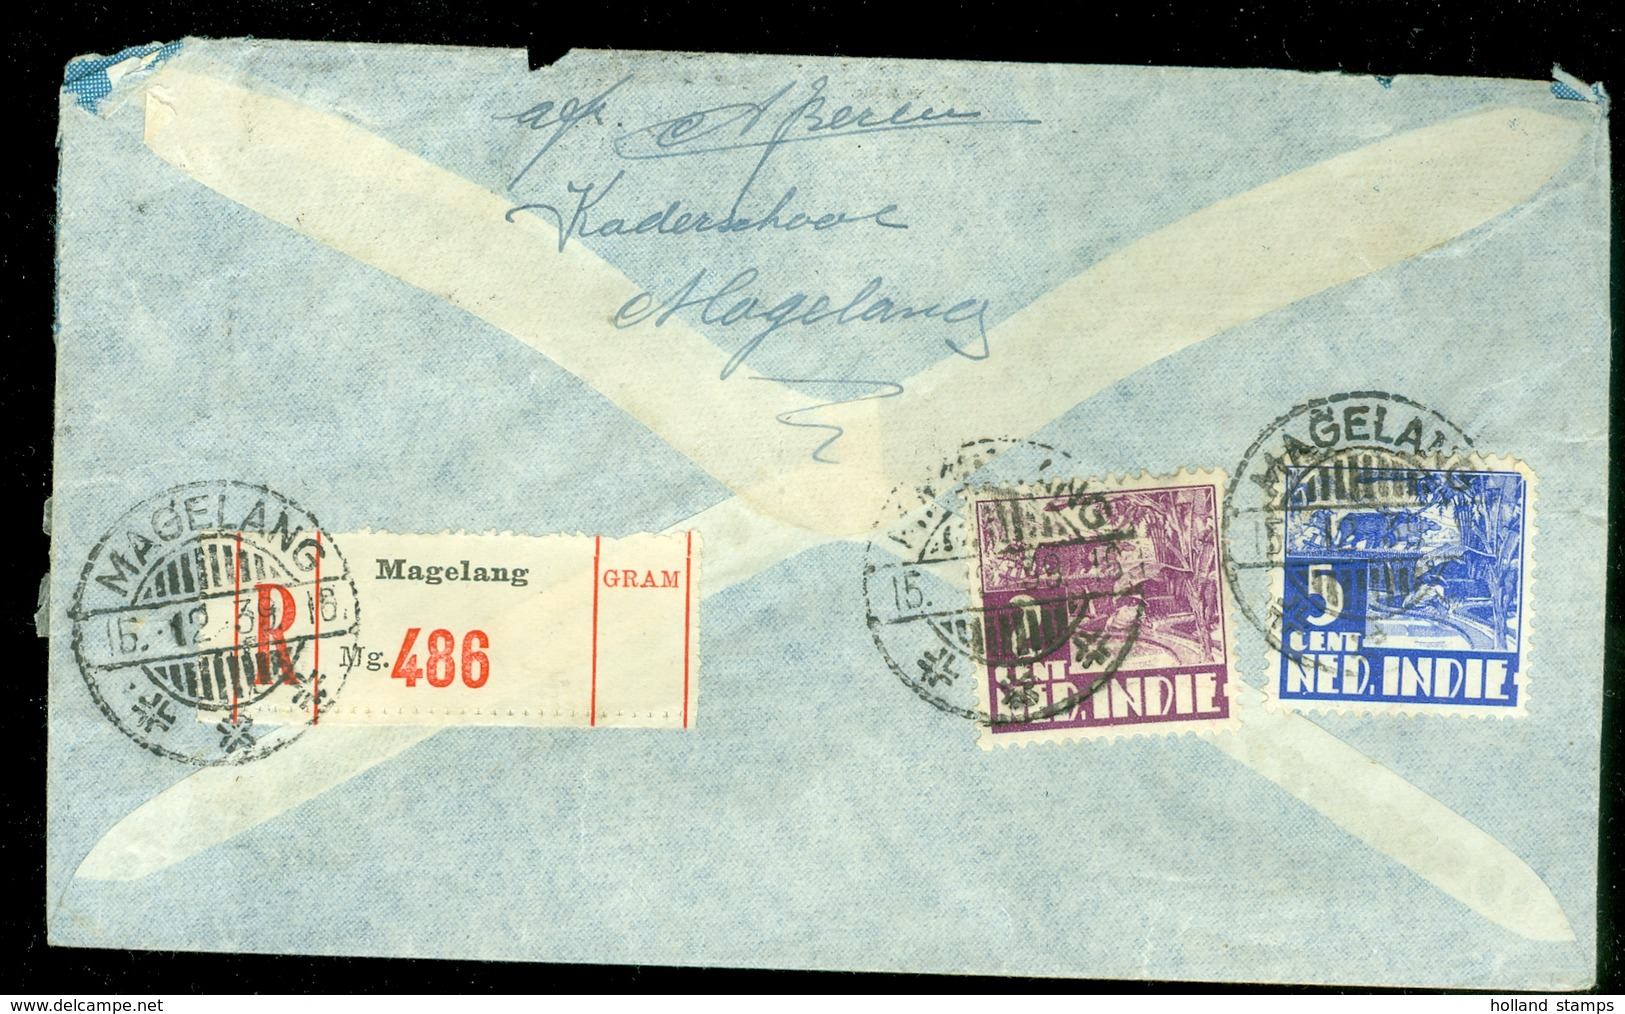 AANGETEKENDE LUCHTPOST BRIEFOMSLAG Uit 1939 Gelopen Van MAGELANG NED-INDIE Naar AMSTERDAM * NVPH 266 - 71 (11.506a) - Nederlands-Indië